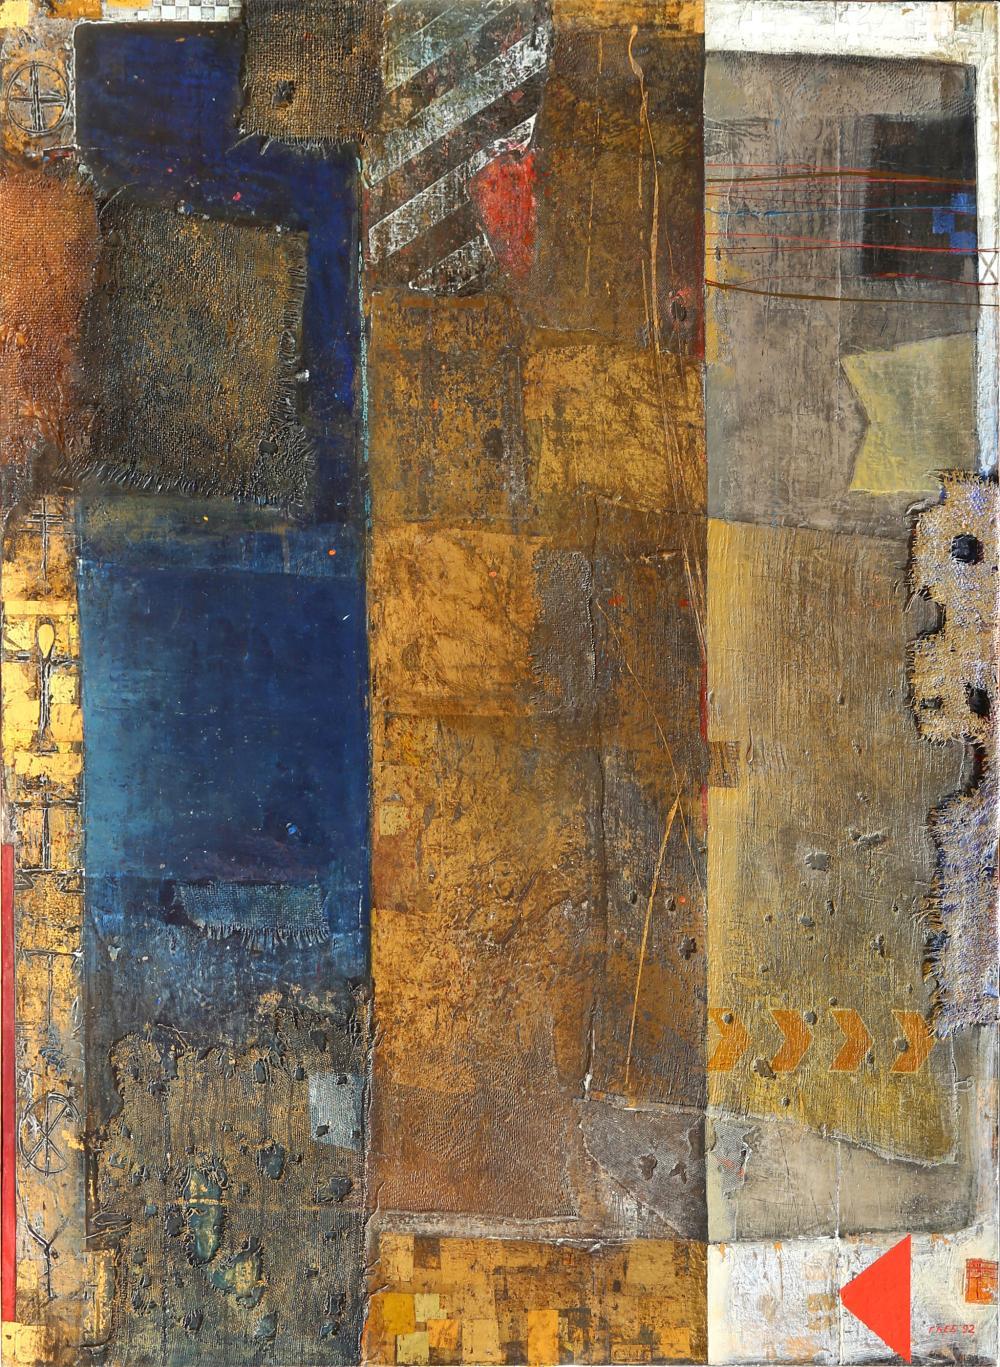 Gleb Sergeevich Bogomolov, Arc with Golden Vertical, Oil Painting